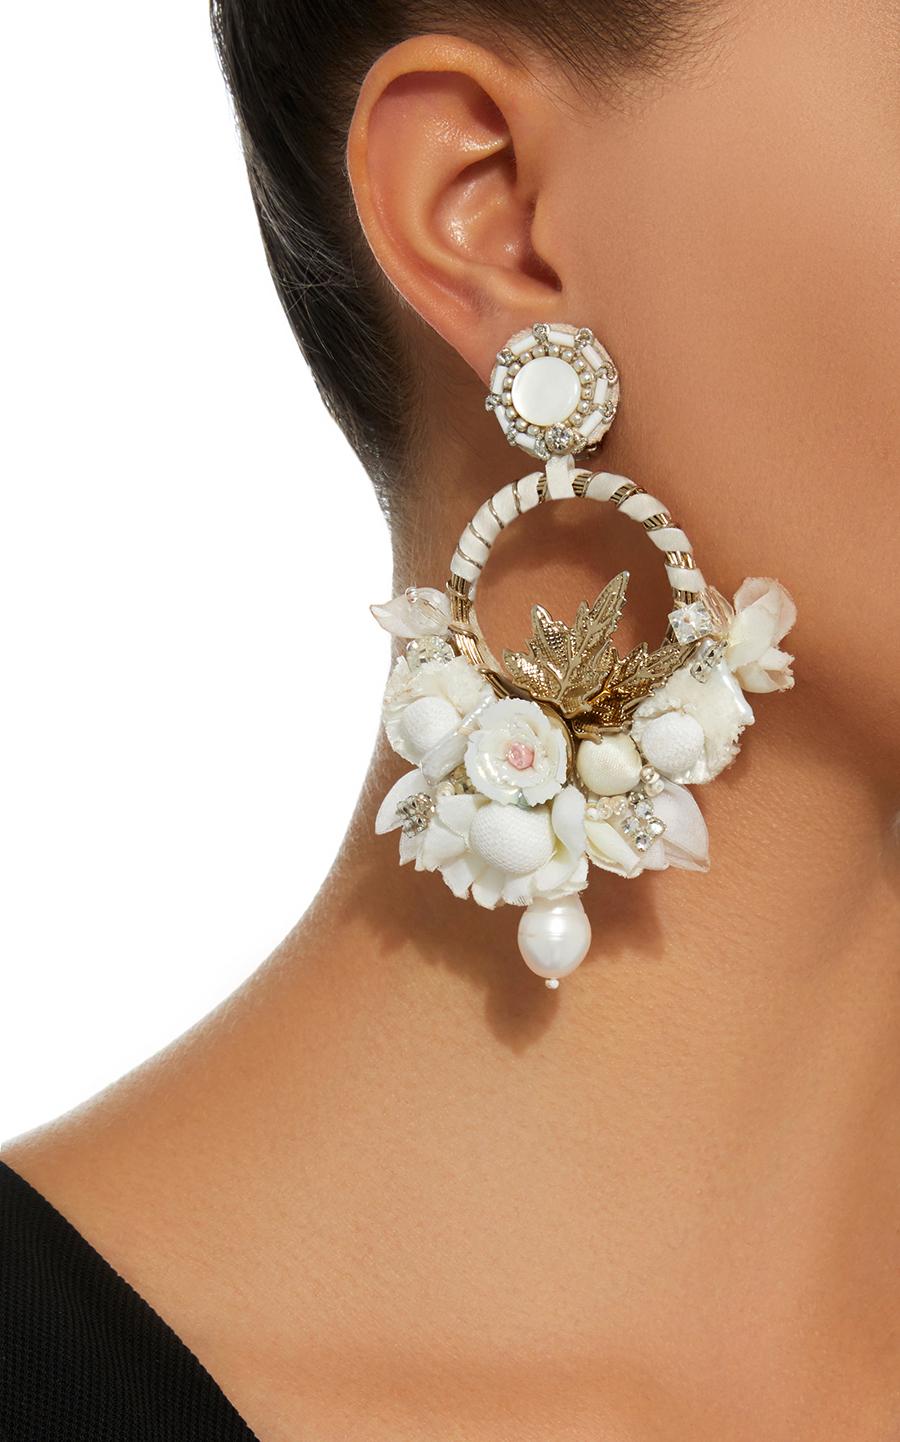 Ranjana Khan earrings White Floral Hoop stylish clip on earrings